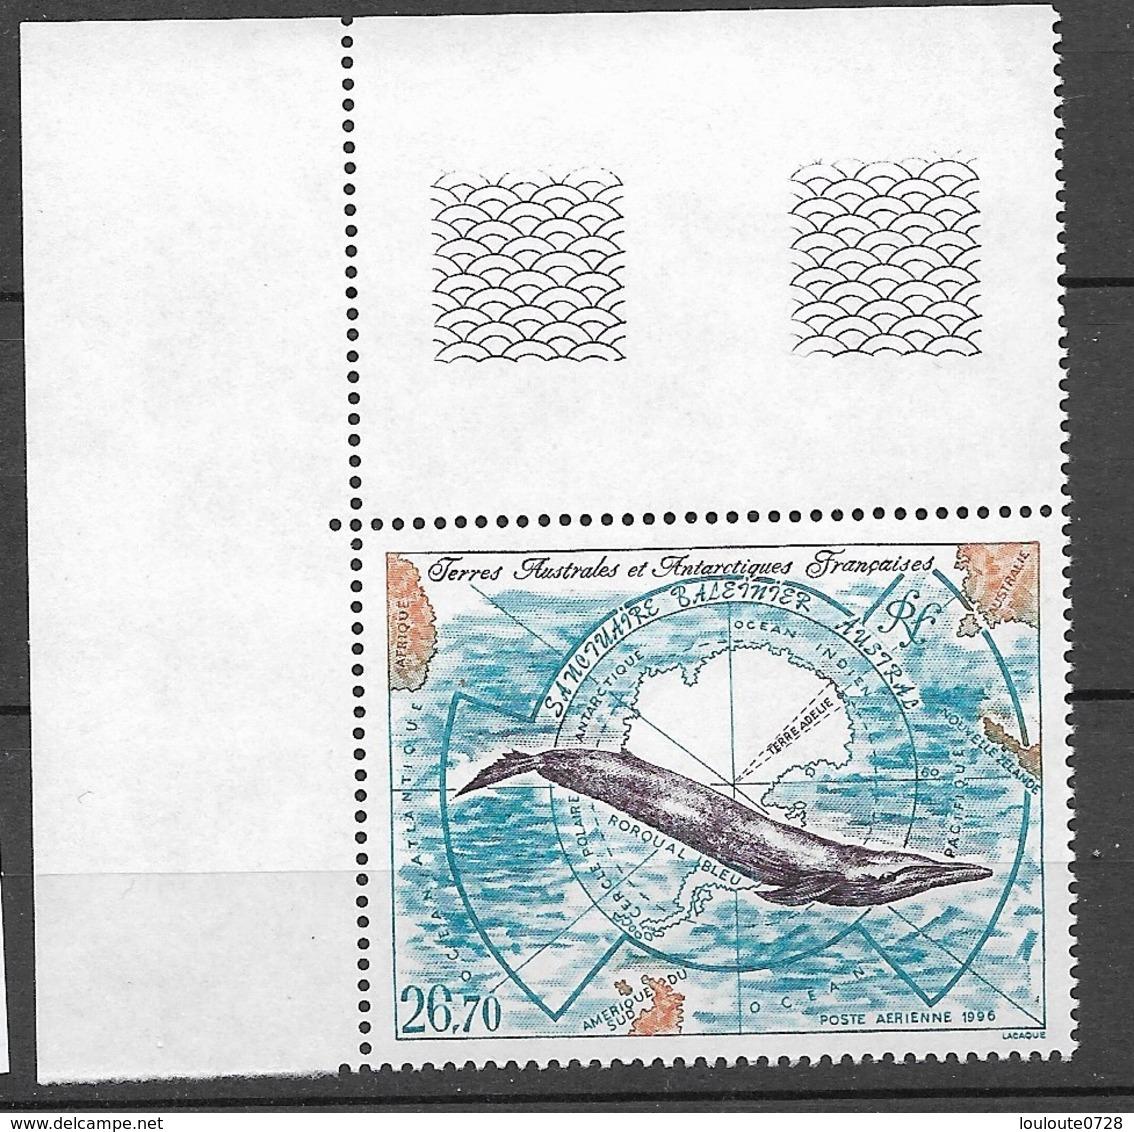 TAAF 1996 Poste Aérienne N° 139  N * * Luxe  TTB - Colecciones & Series